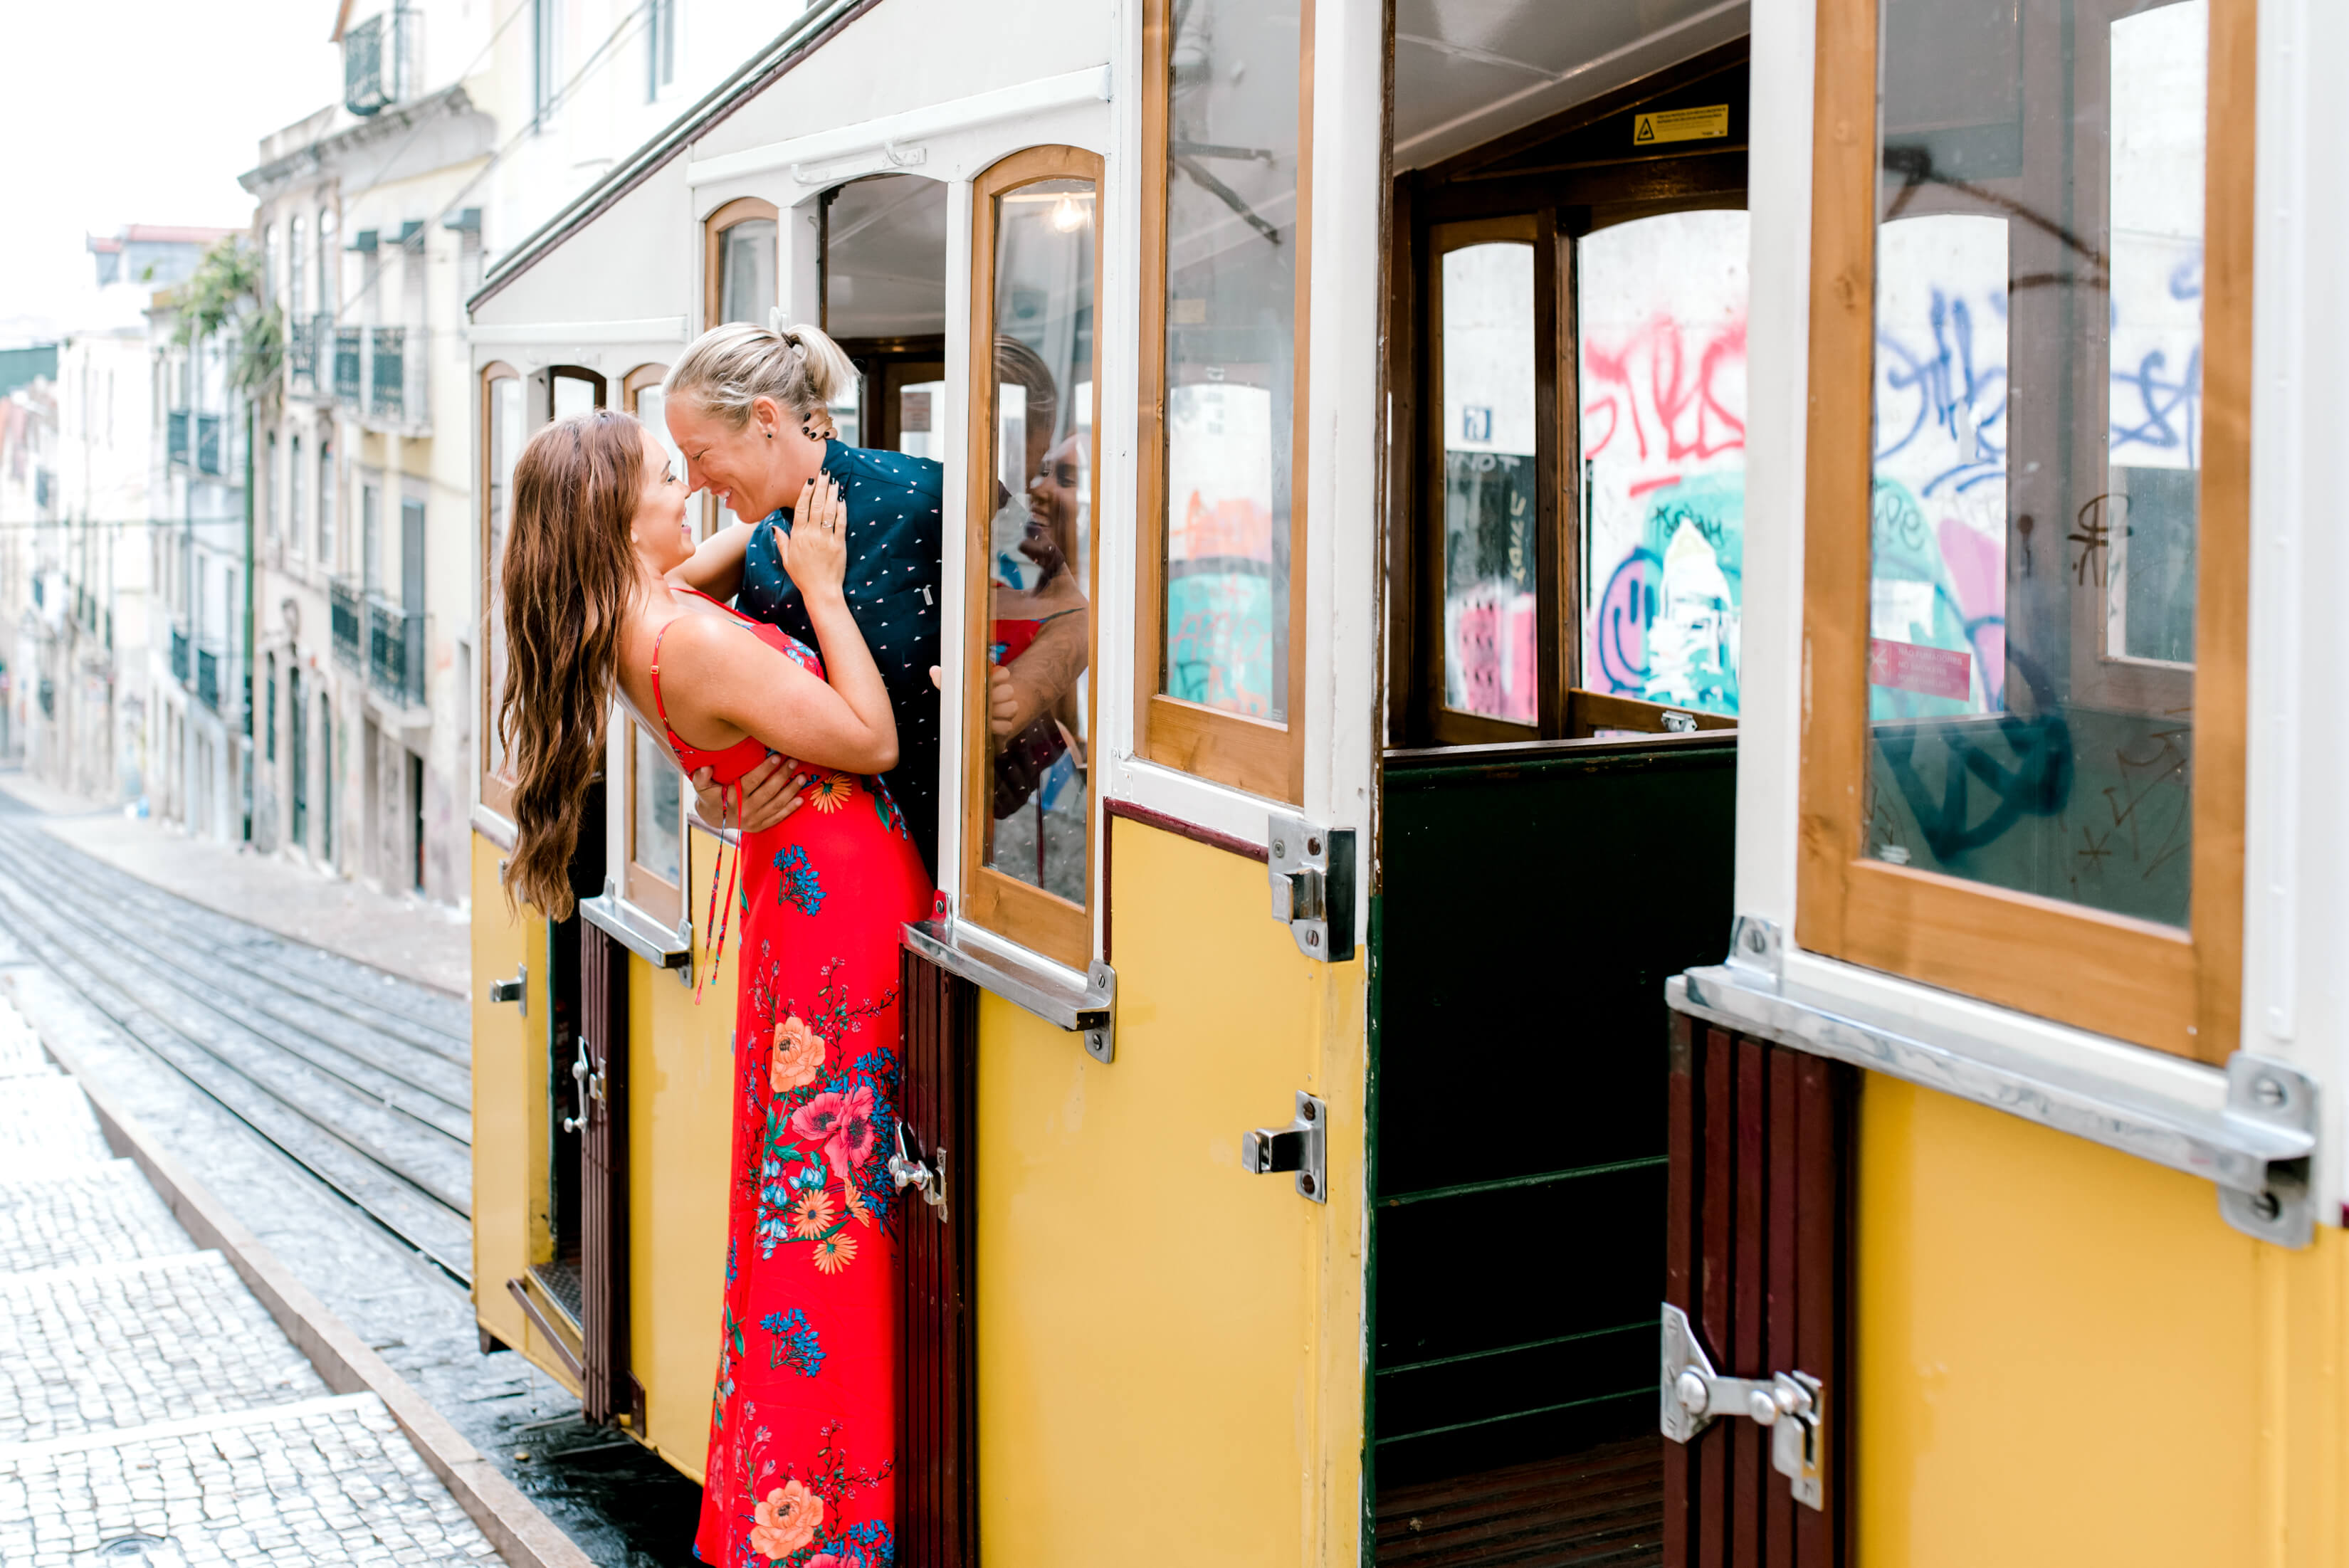 The Top 20 Romantic Photos of 2019